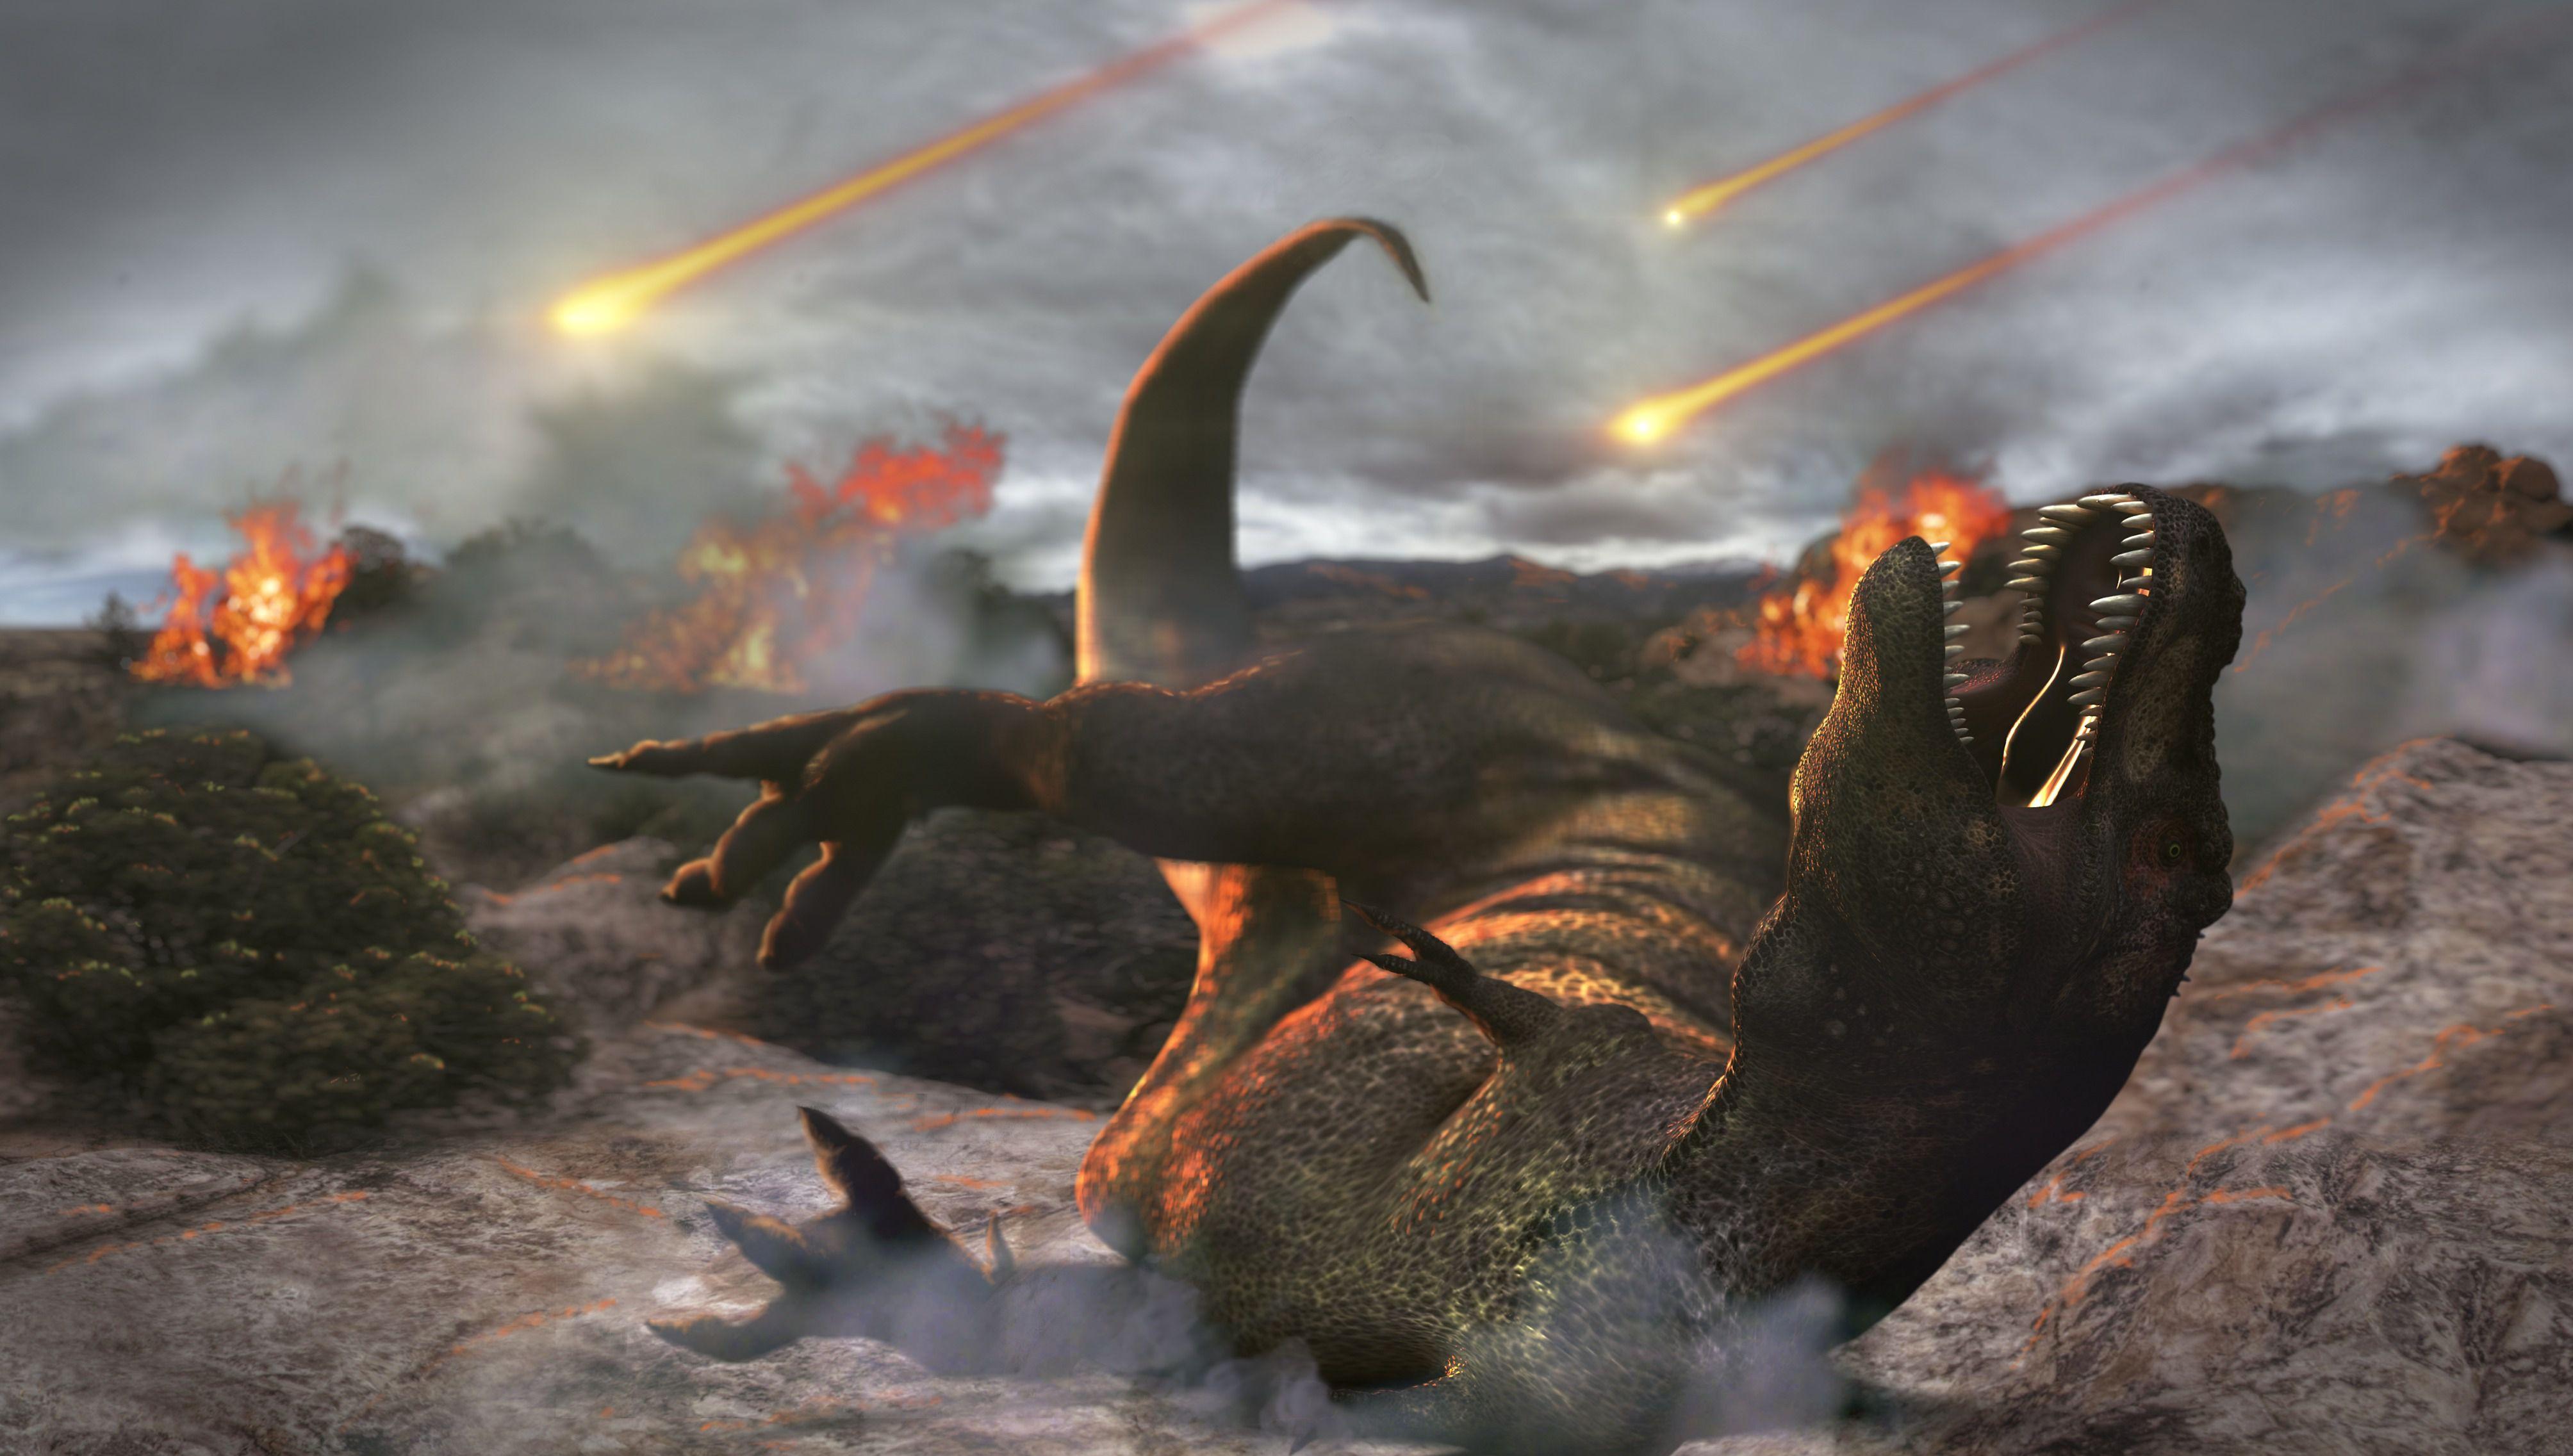 динозавры и метеорит картинки